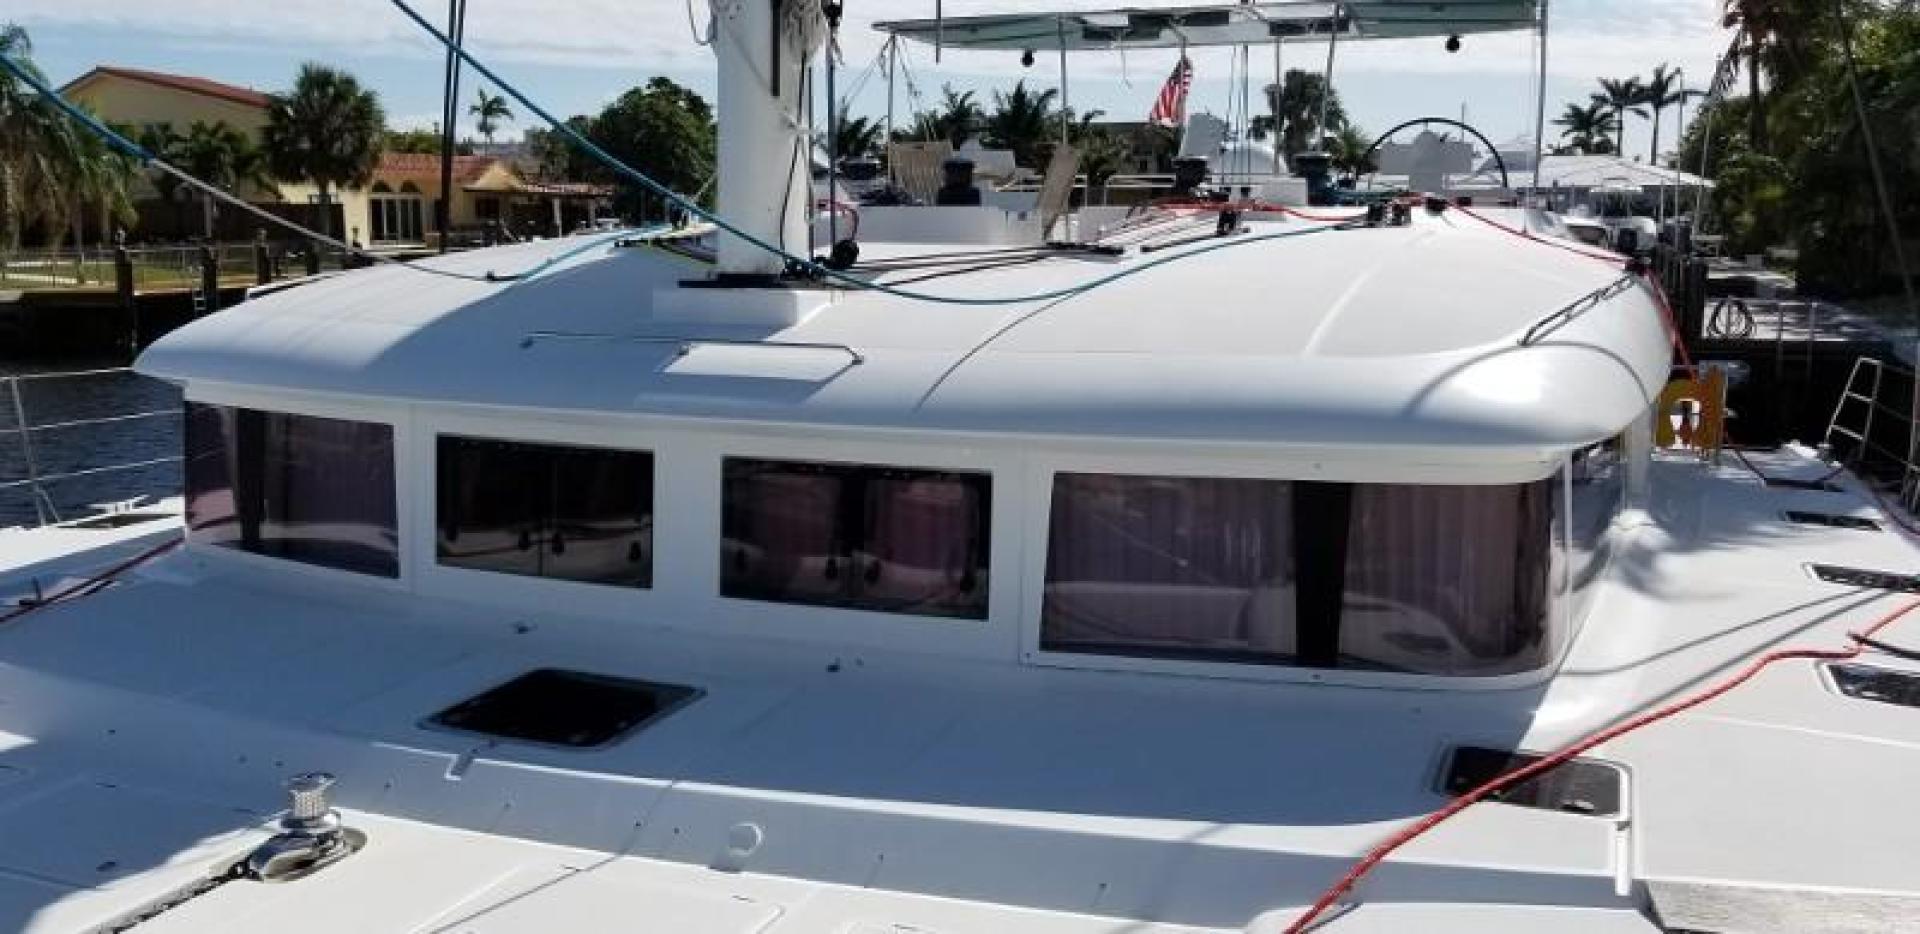 Lagoon-620 2011-Princess Hera Fort Lauderdale-Florida-United States-303760 | Thumbnail